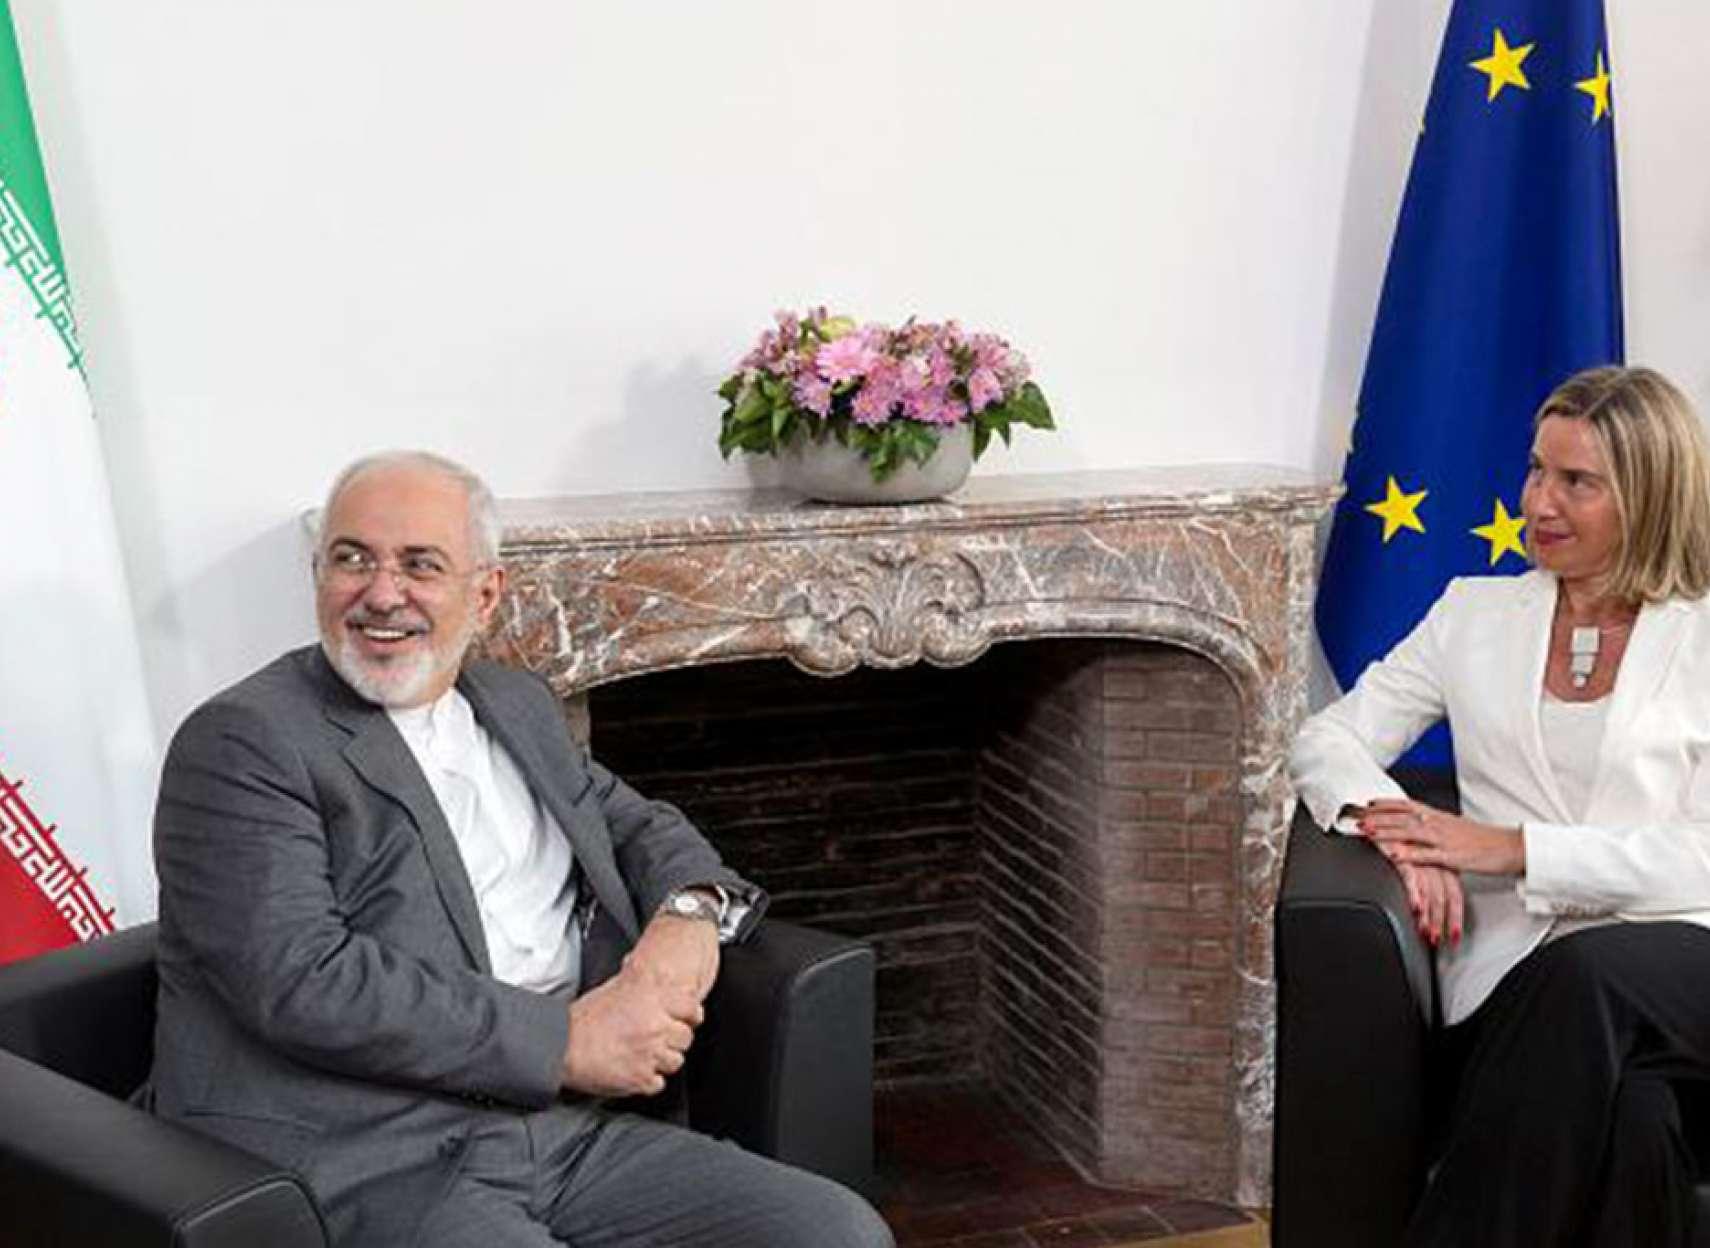 news-barjam-iran-eu